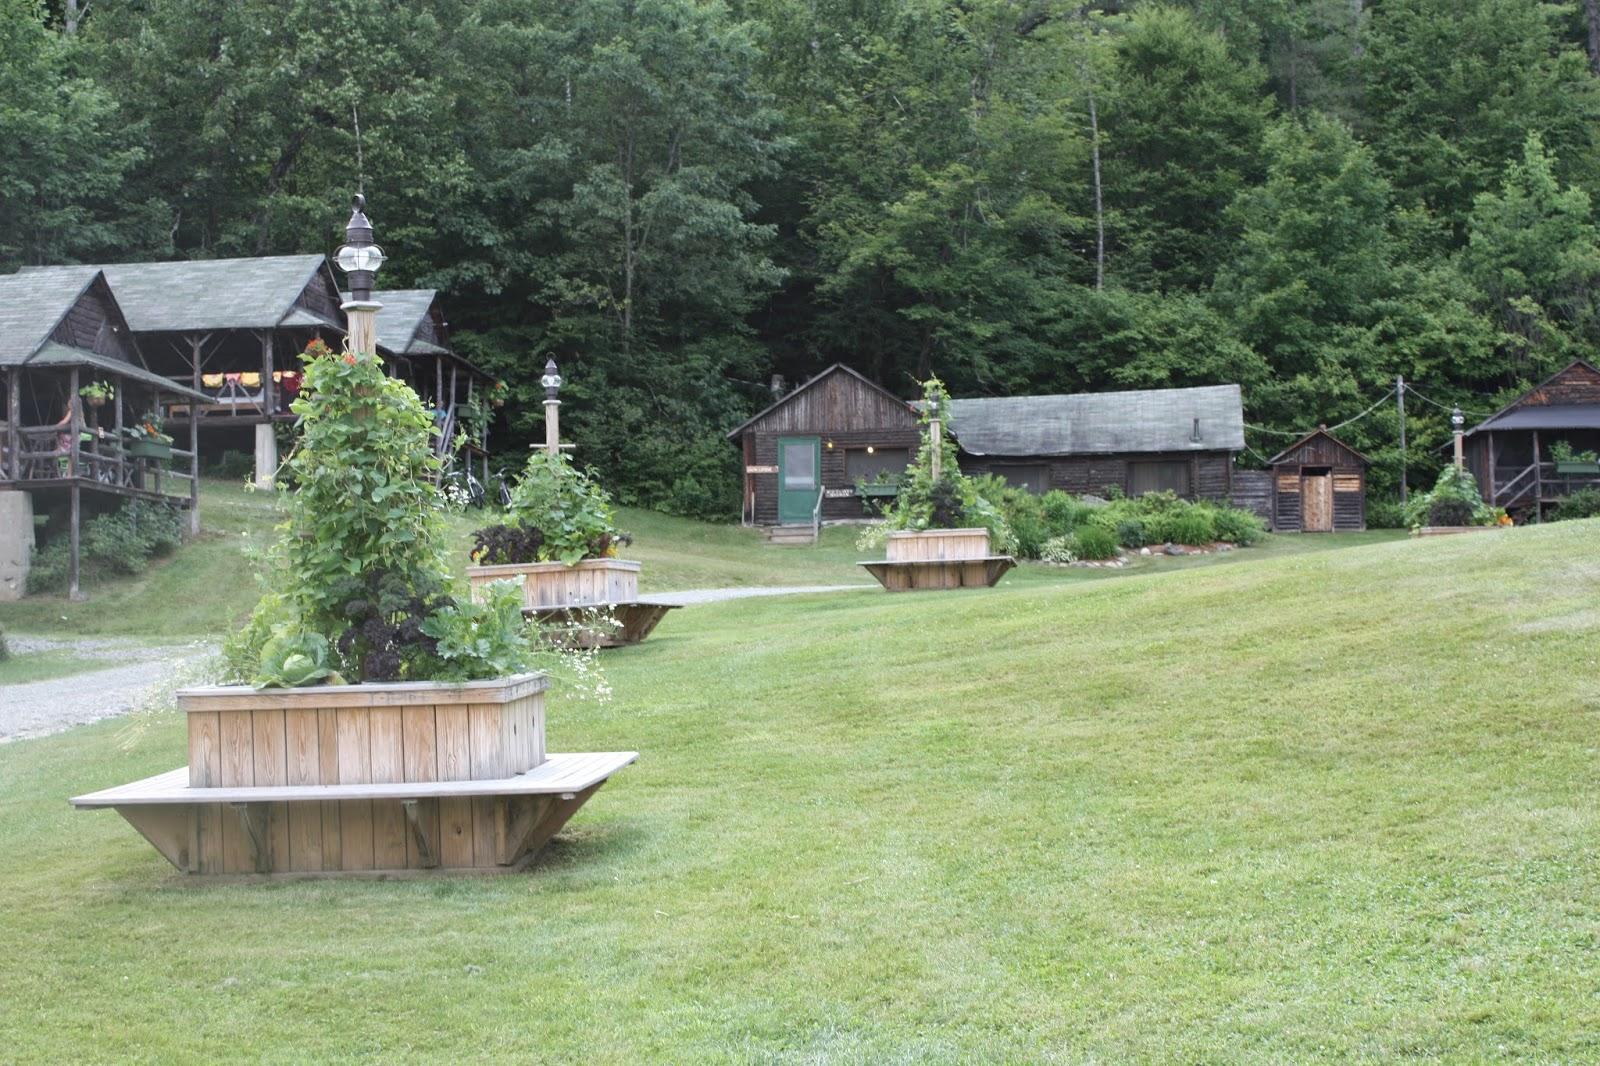 camp ogontz cabins gardens